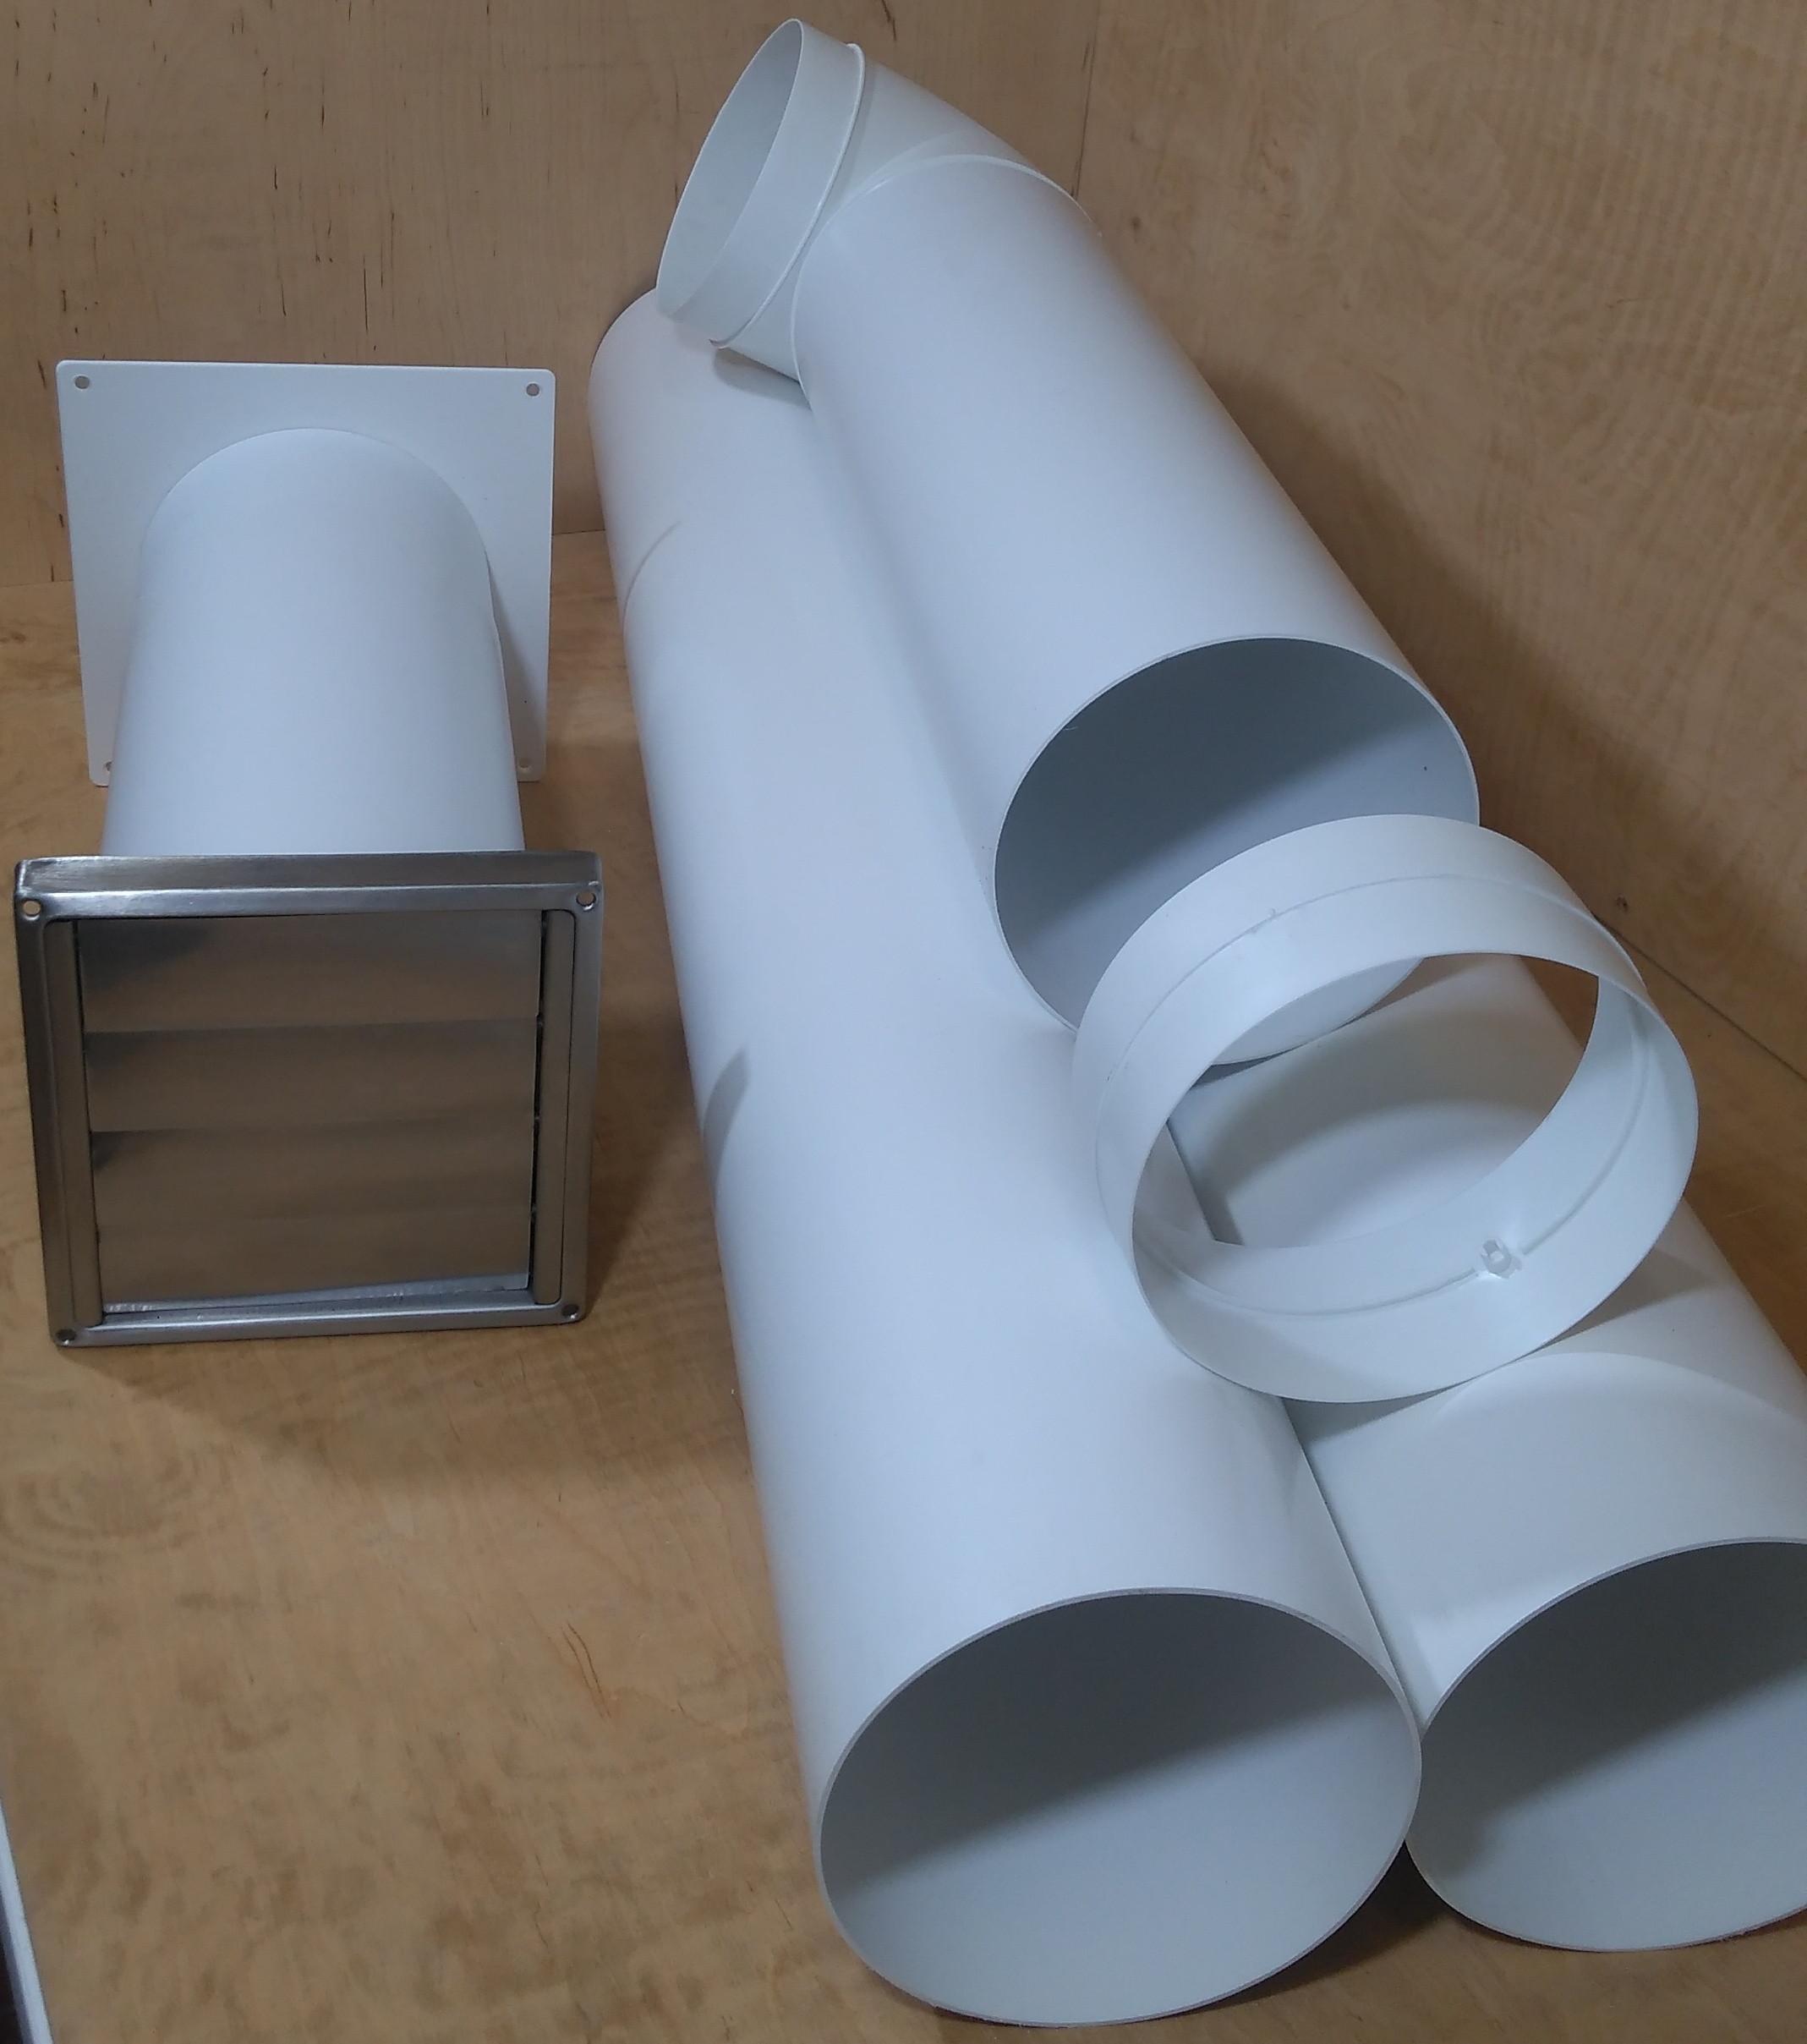 L/änge: 30-50cm Teleskop-Rohr Nennweite 150mm L/üftungsrohr